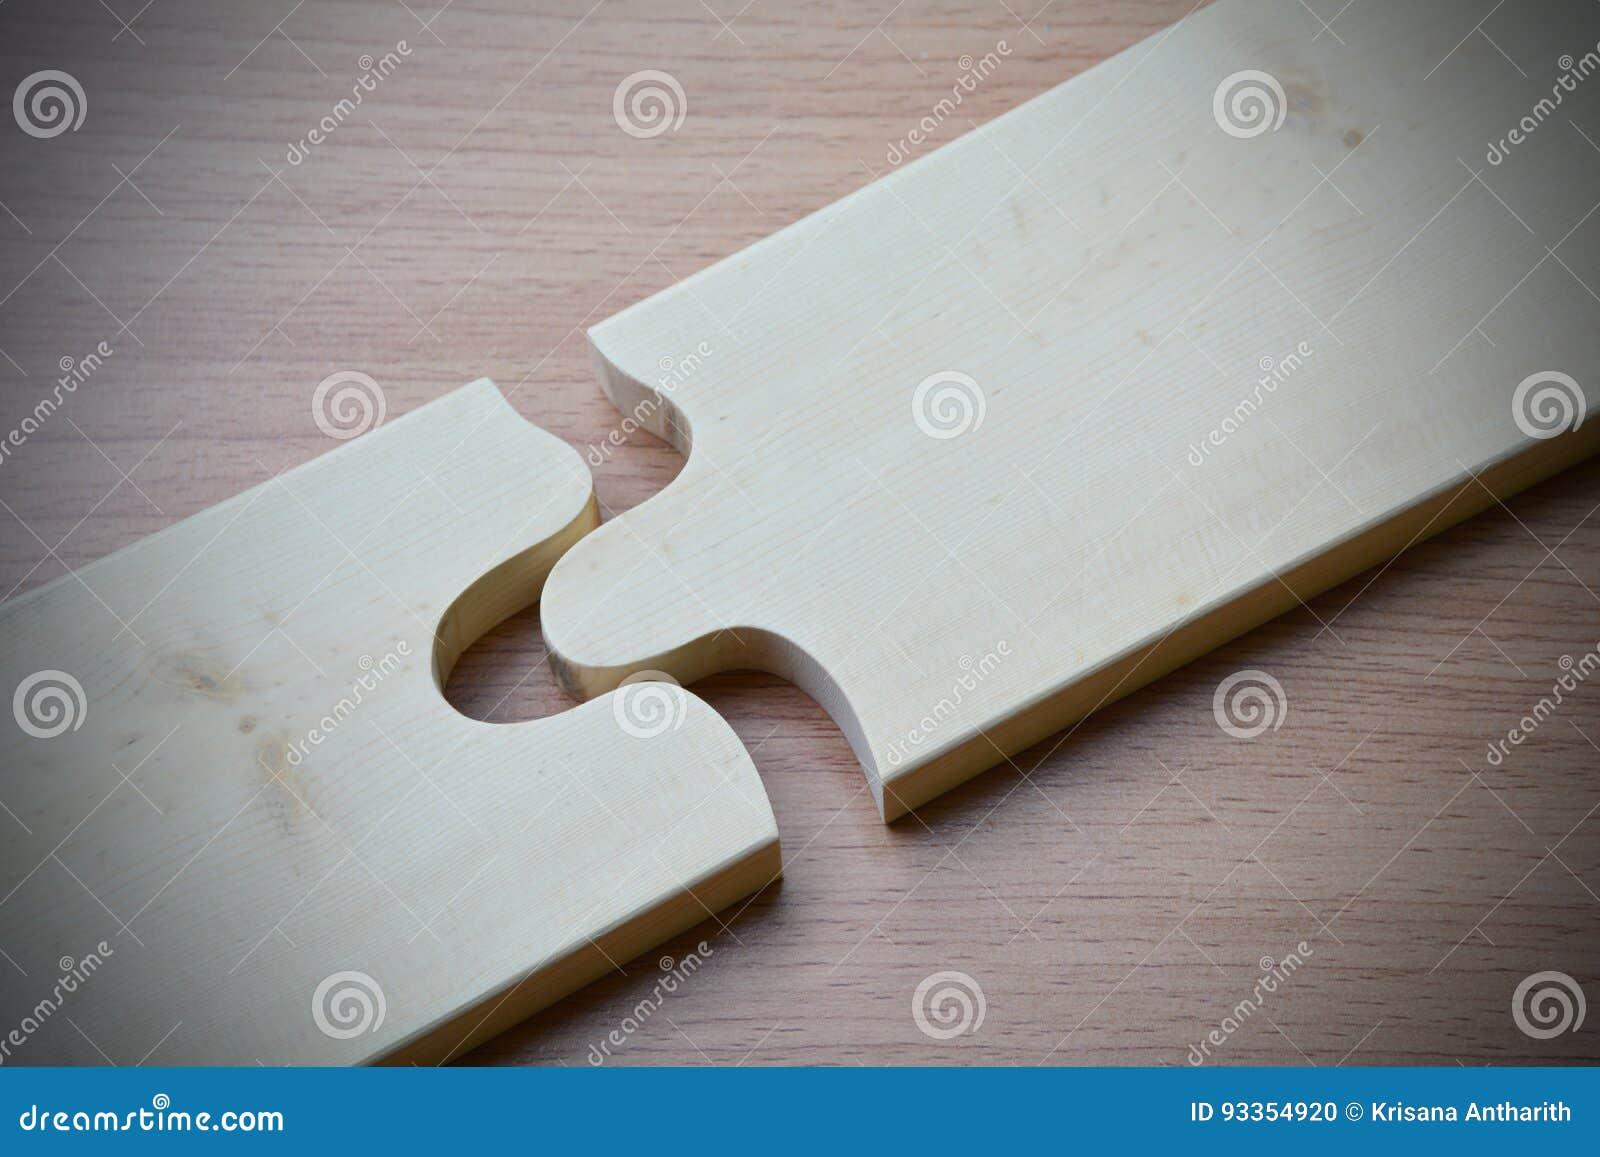 wood jigsaw piece texture pattern on wood table desk wooden back